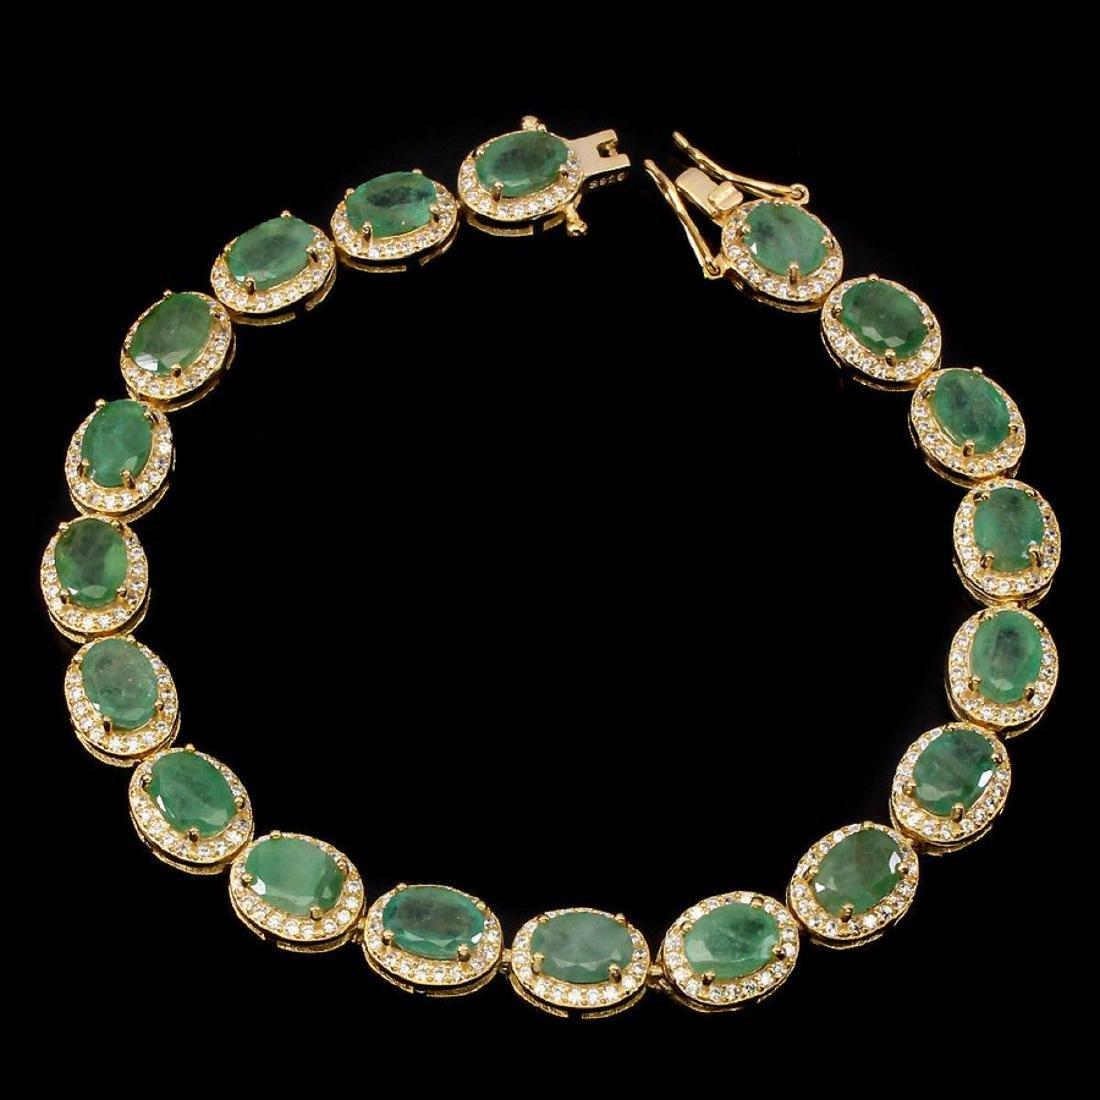 Natural Oval 7x5mm Top Rich Green Emerald Bracelet